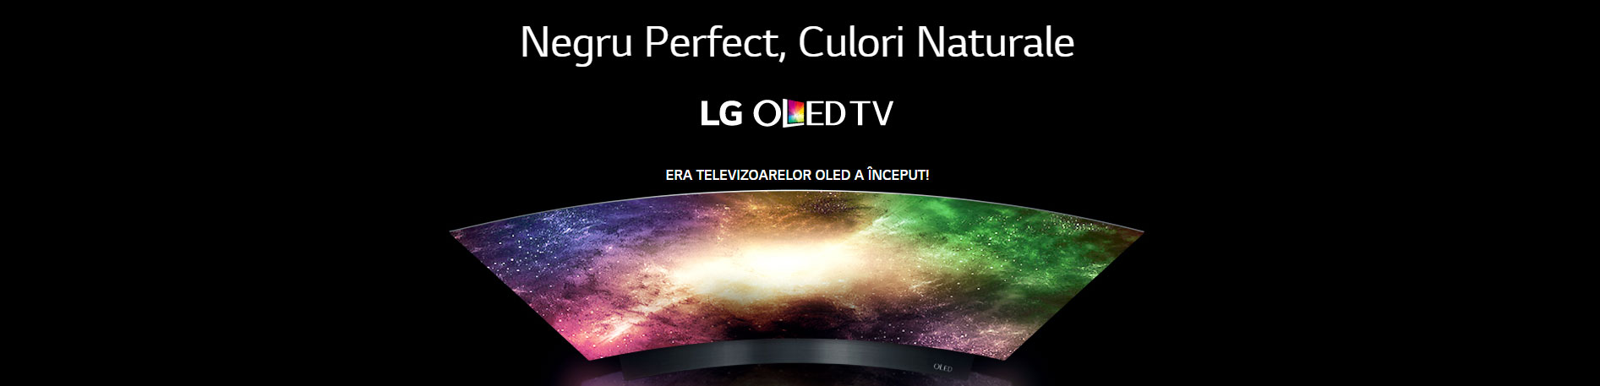 Televizoarele OLED LG Smart TV 4K UHD Review Pareri Preturi Forum. Avantaje si dezavantaje ecrane OLED